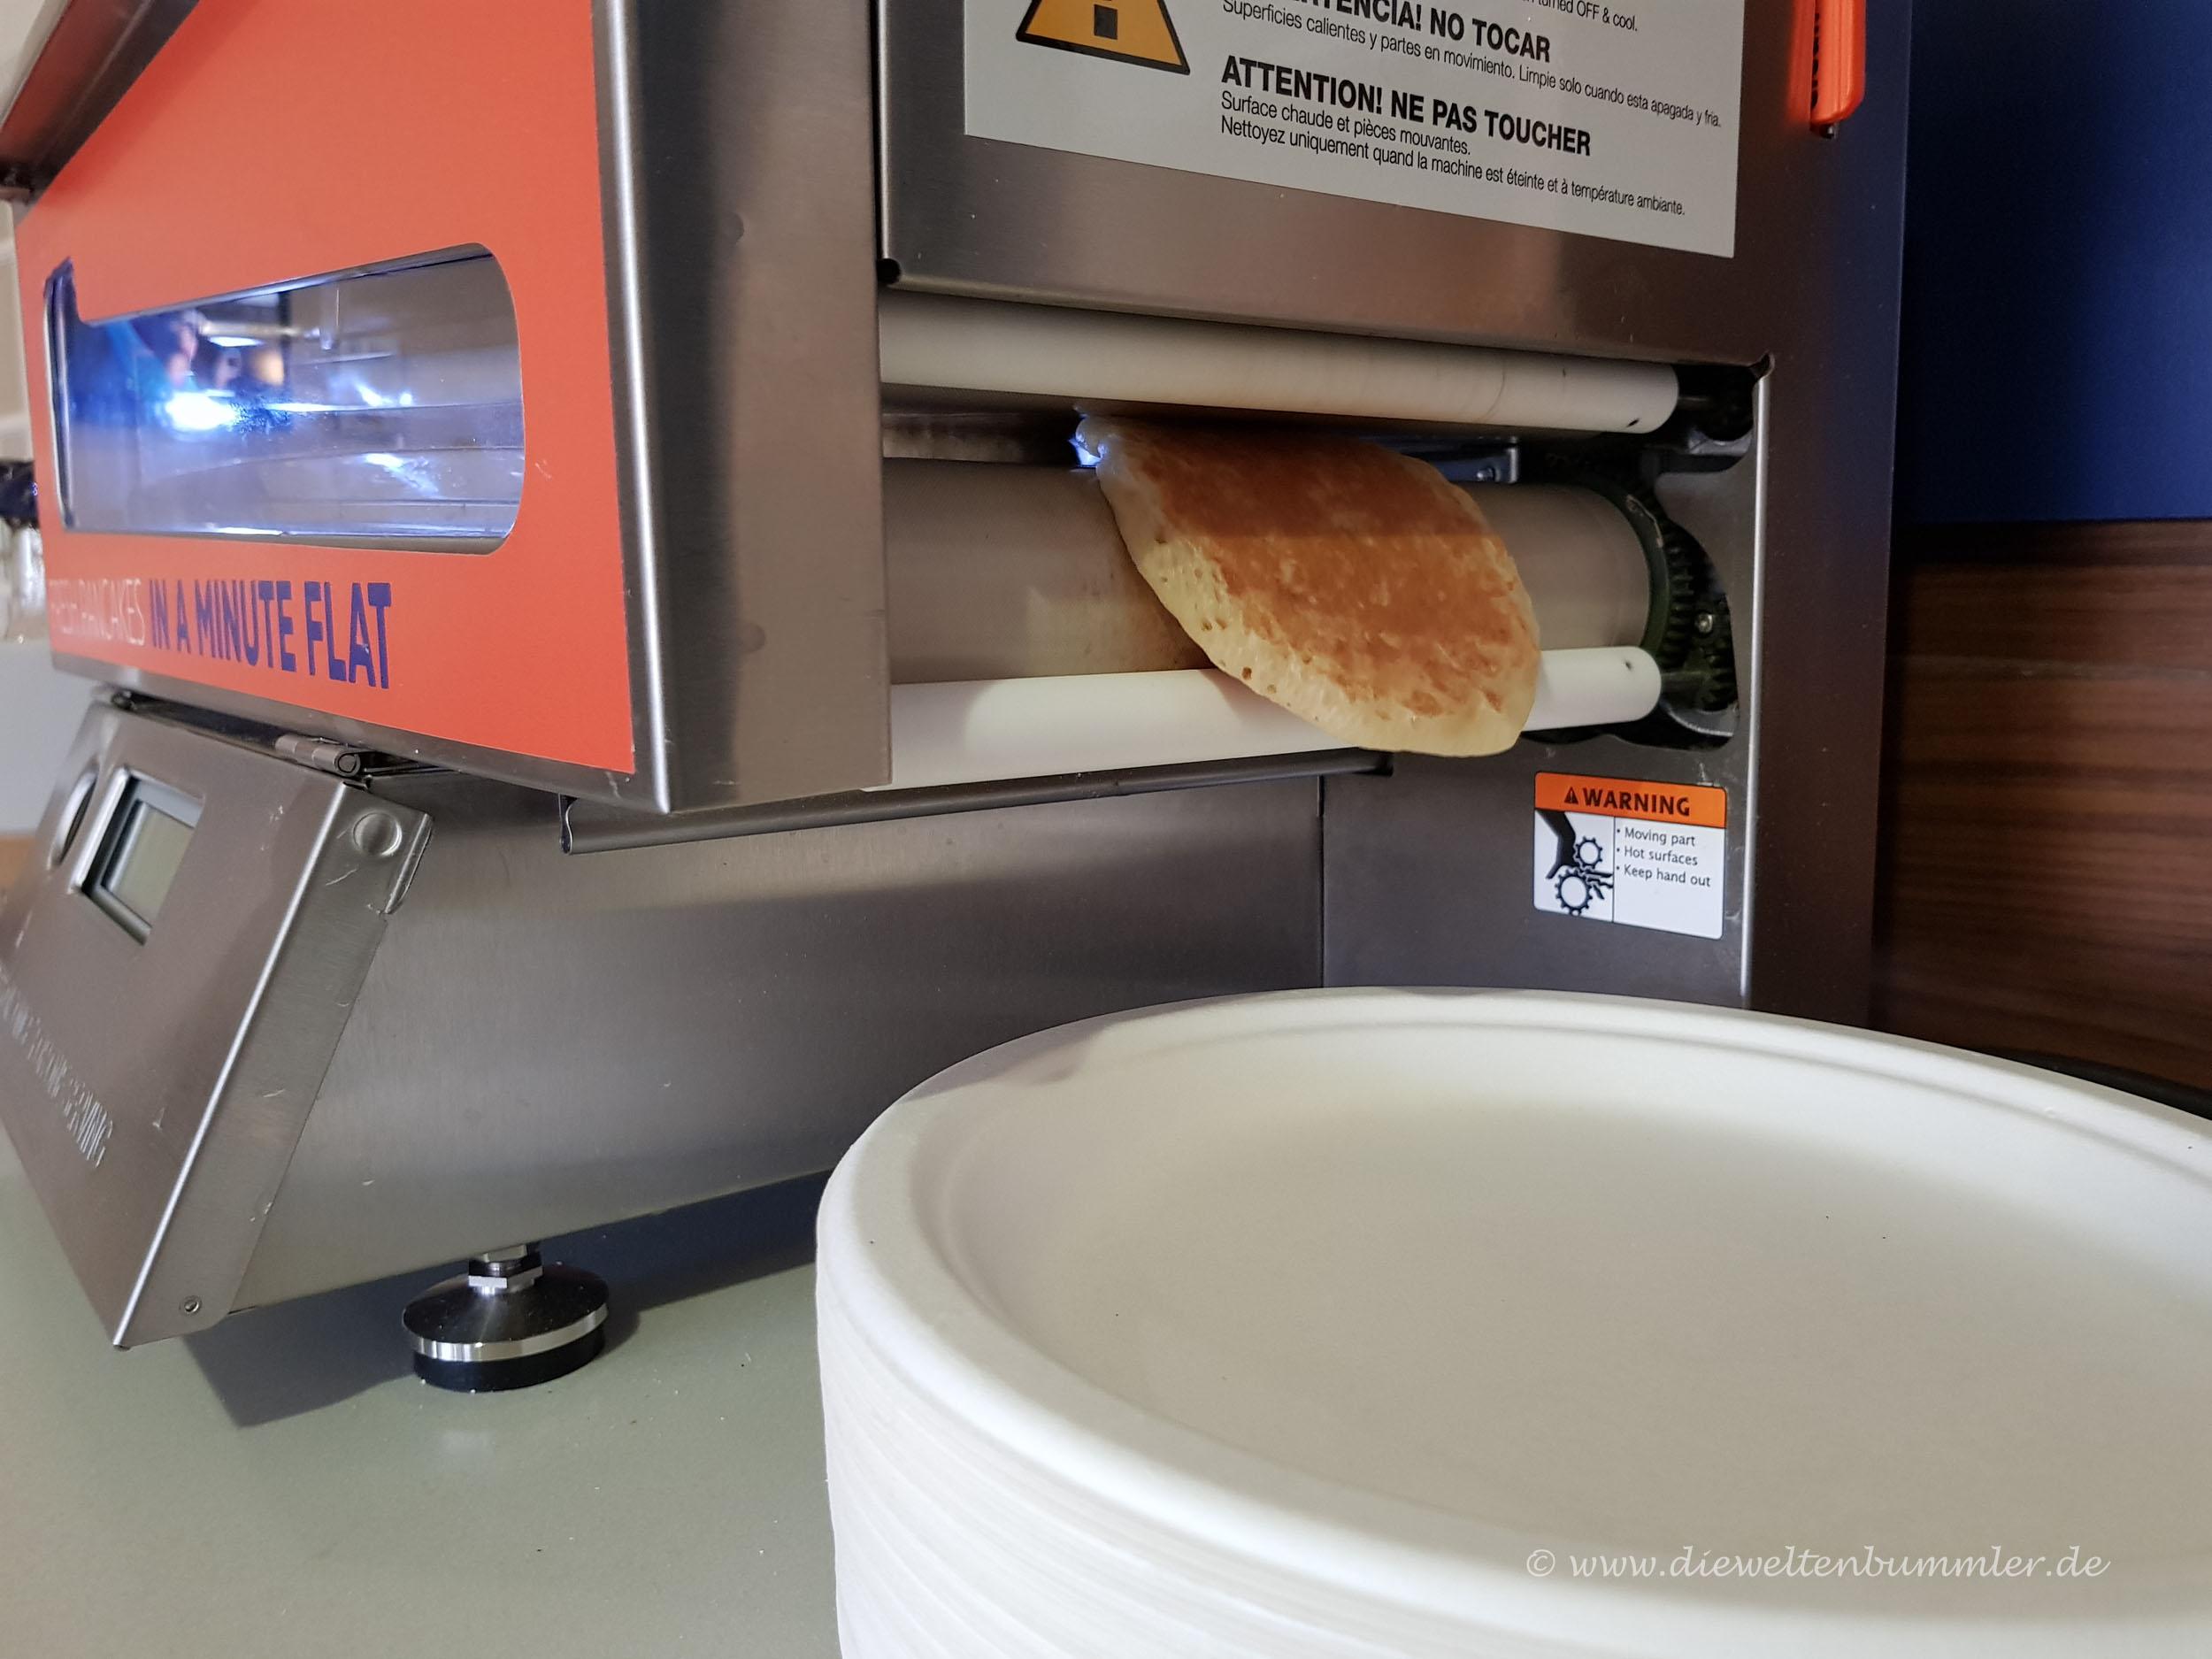 Pancake aus dem Automaten